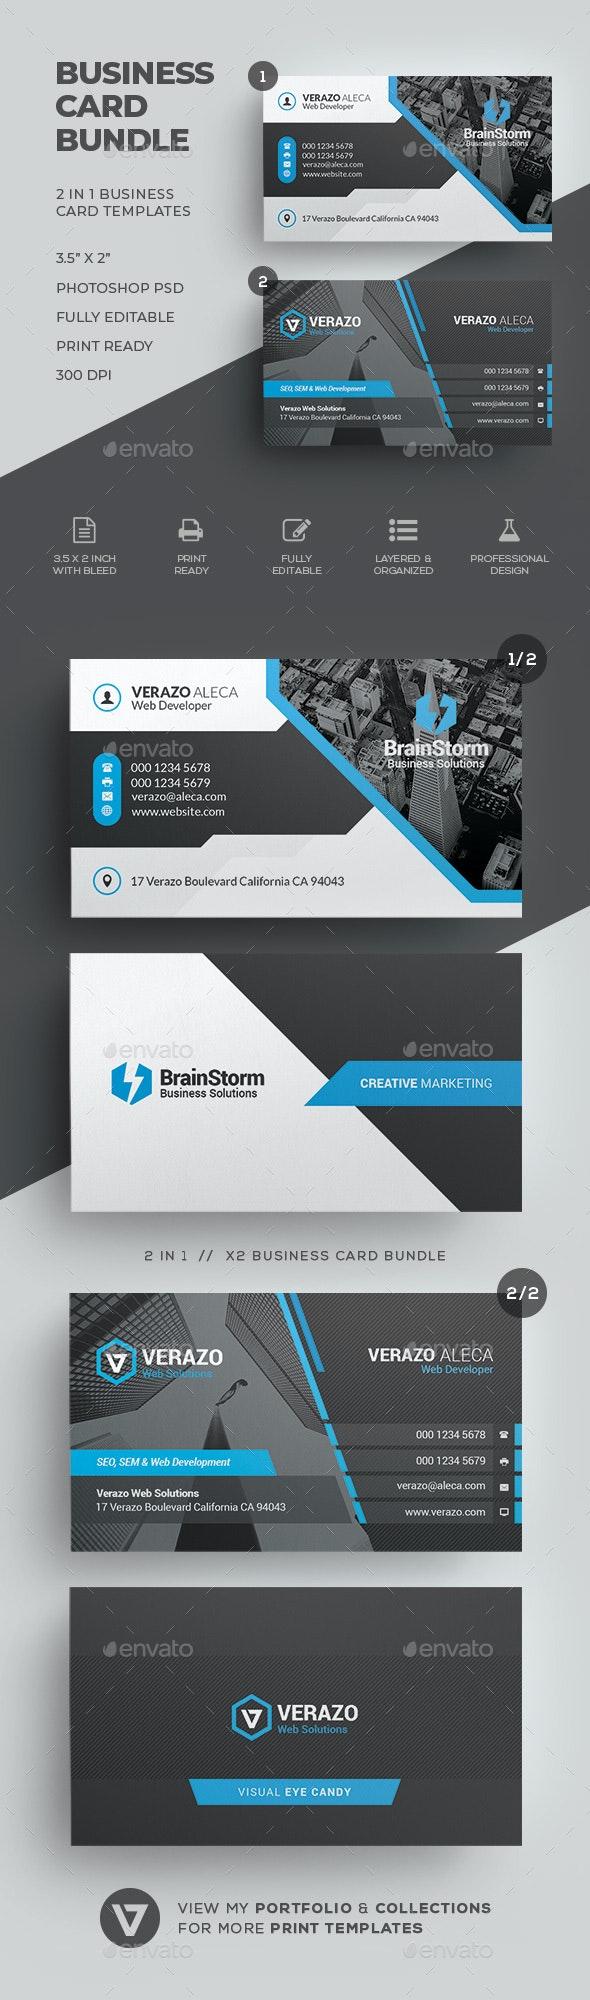 Business Card Bundle 64 - Corporate Business Cards